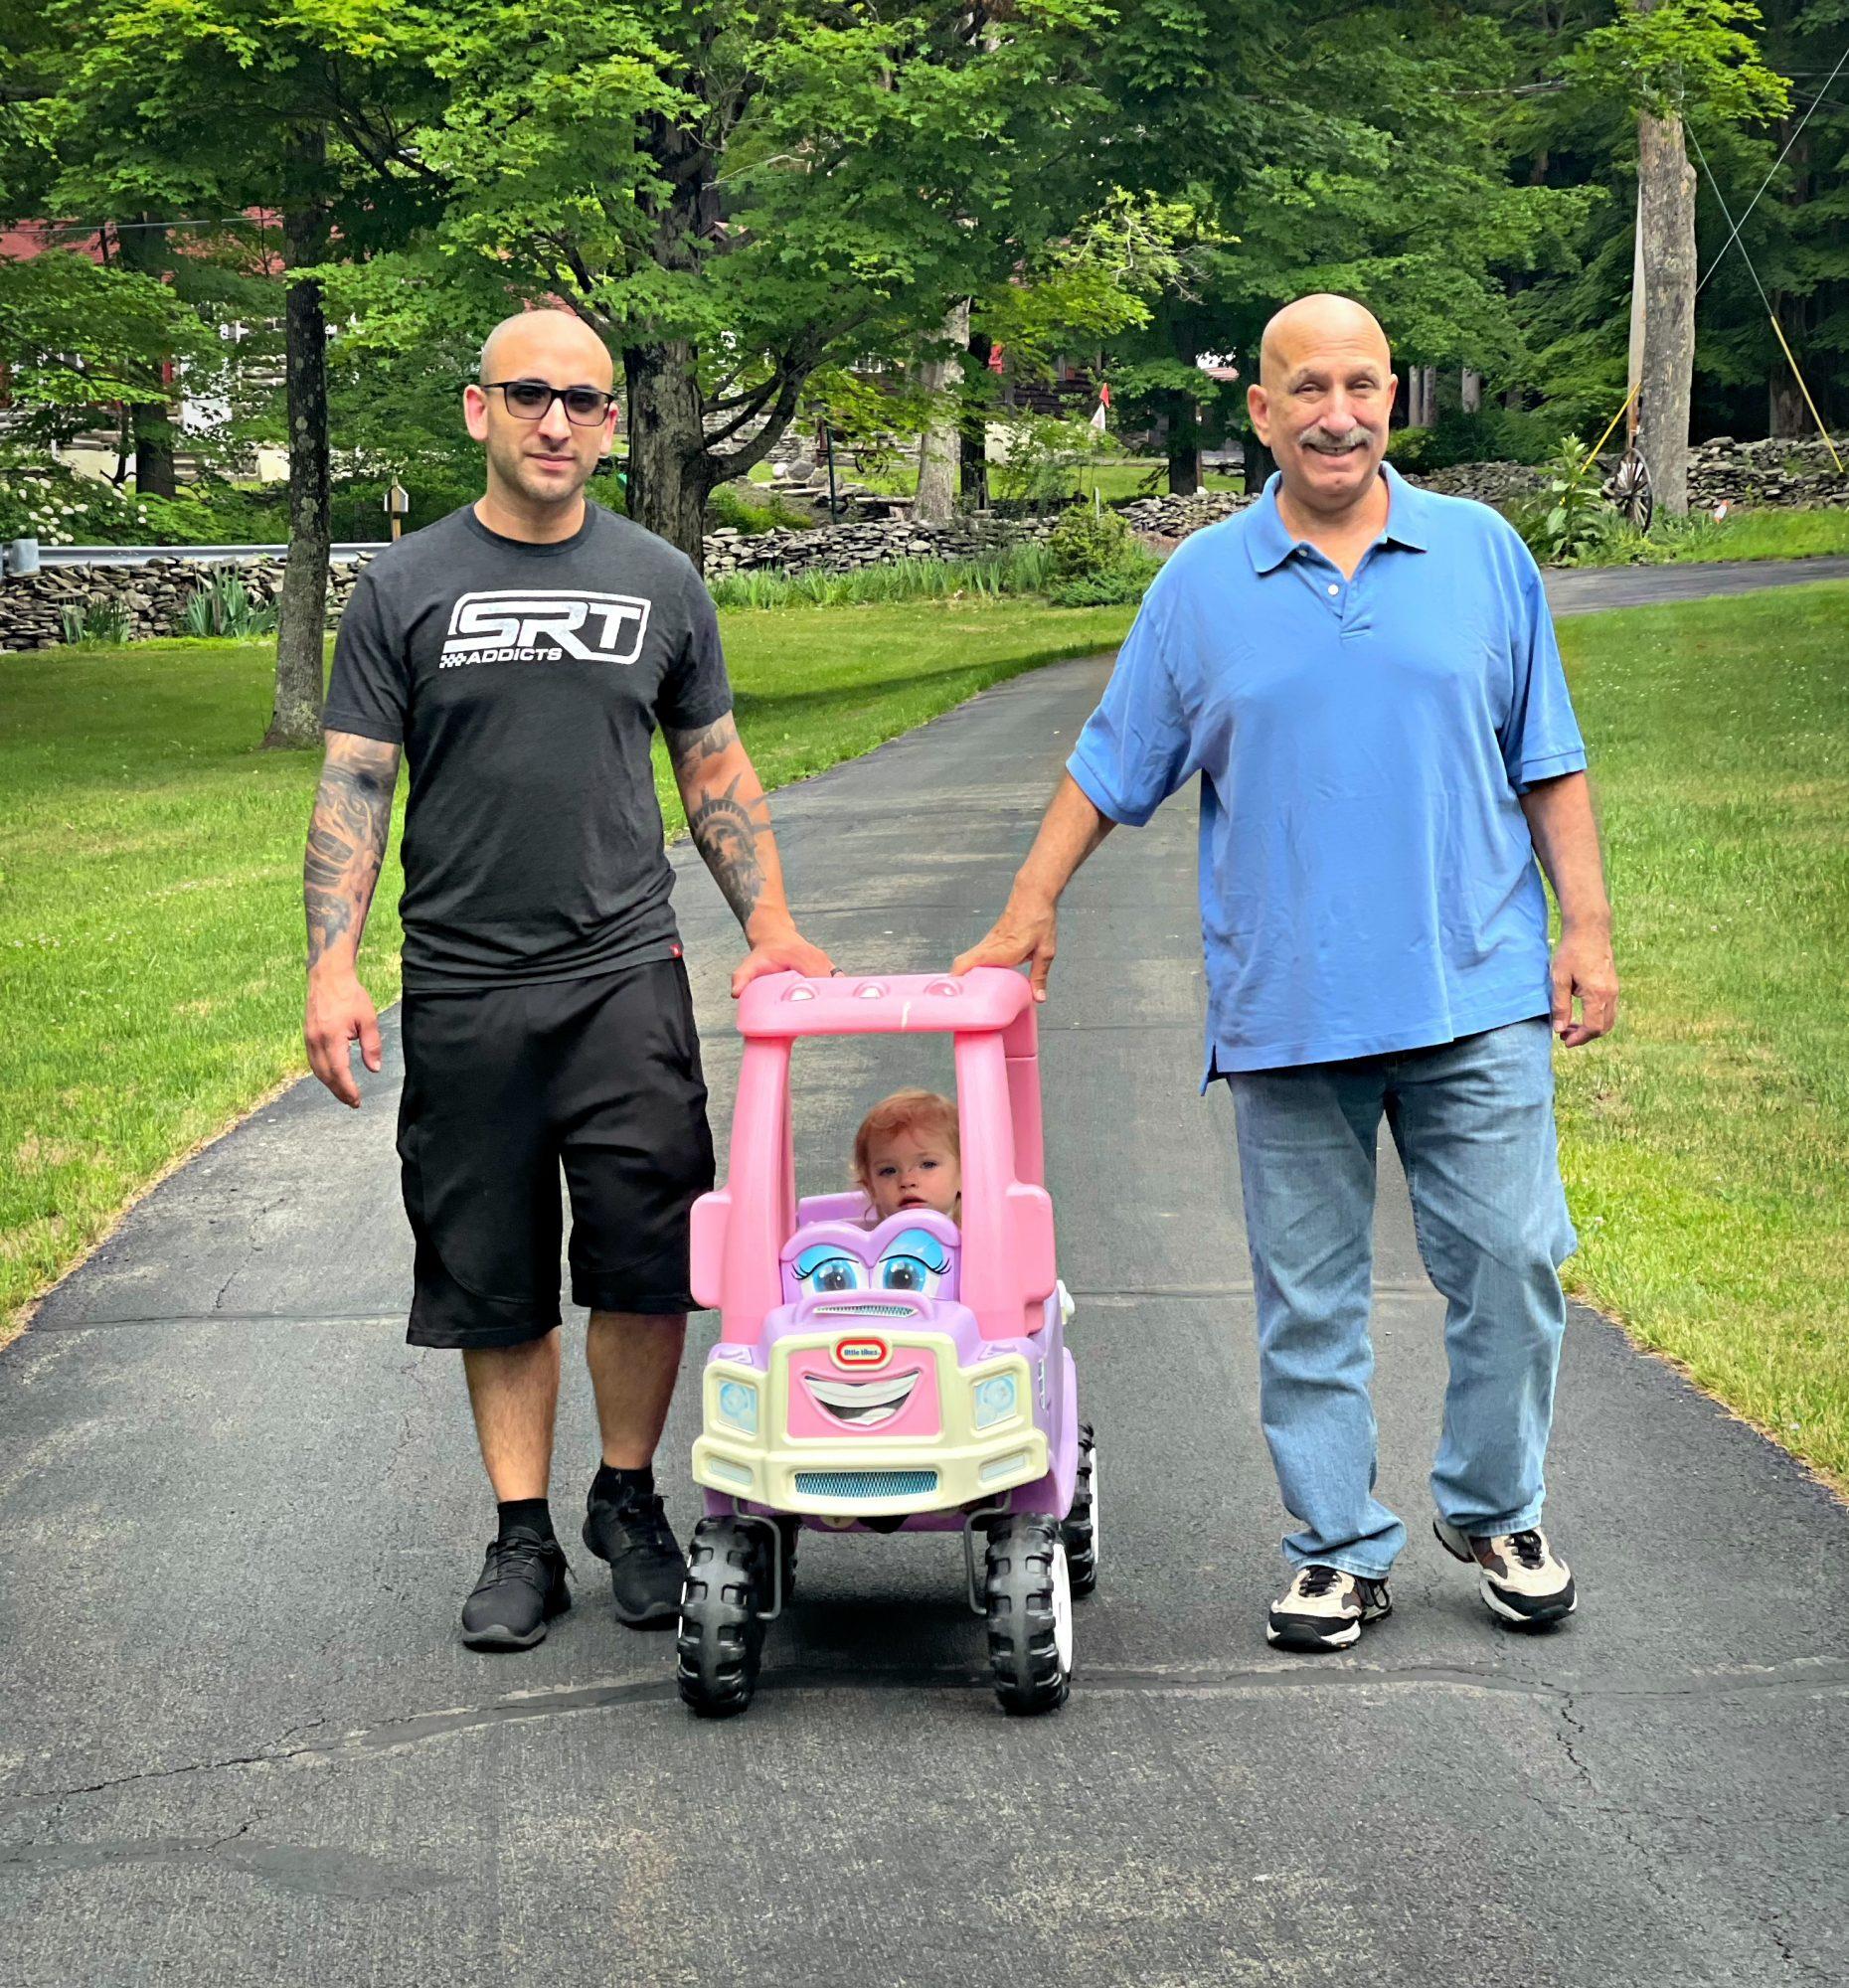 Matt his dad and his daughter